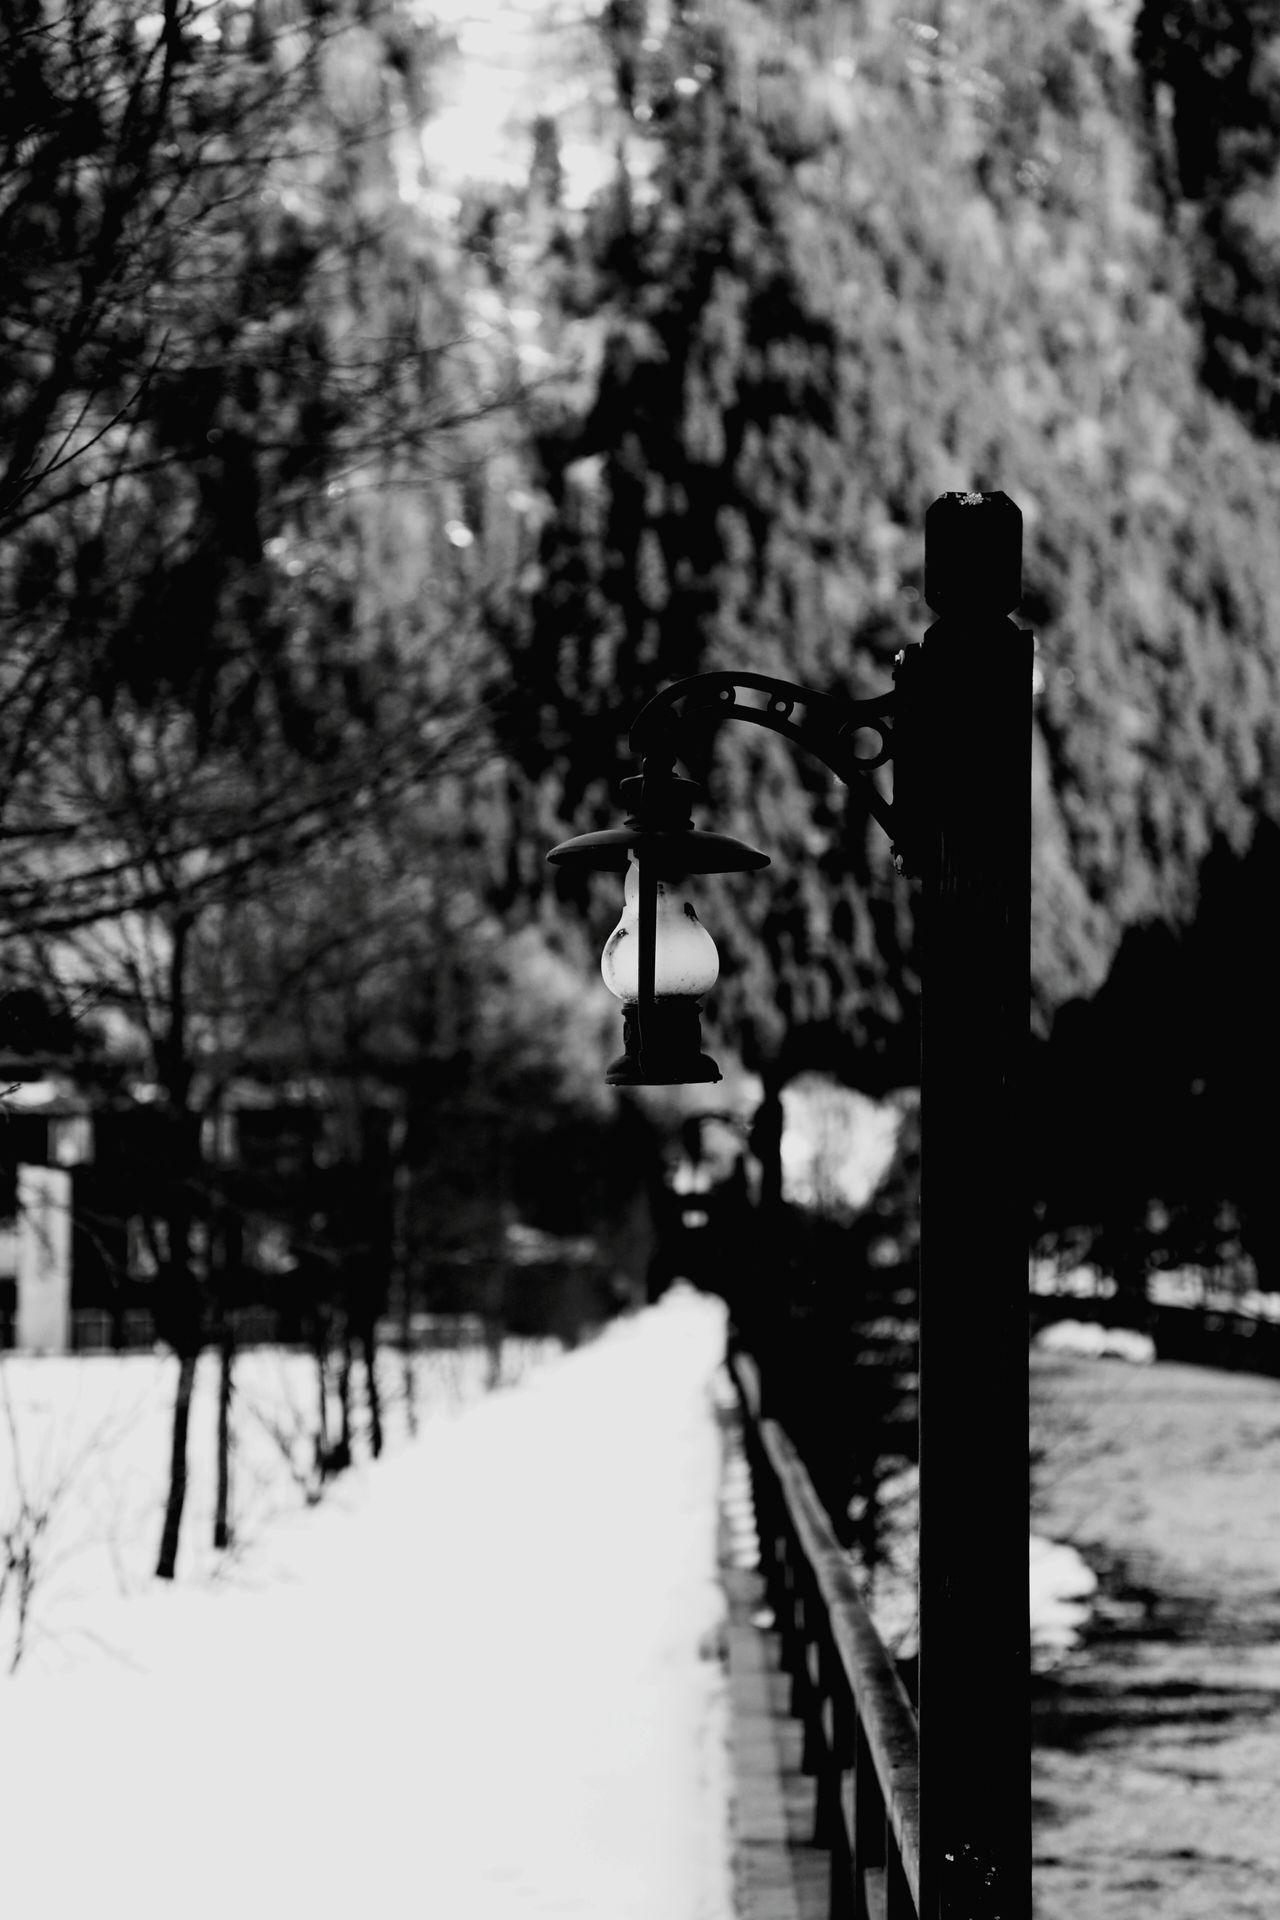 Trabzon Uzungöl Lamp Lamba Siyahbeyaz Blackandwhite Gece Night Photography EyeEm Gallery